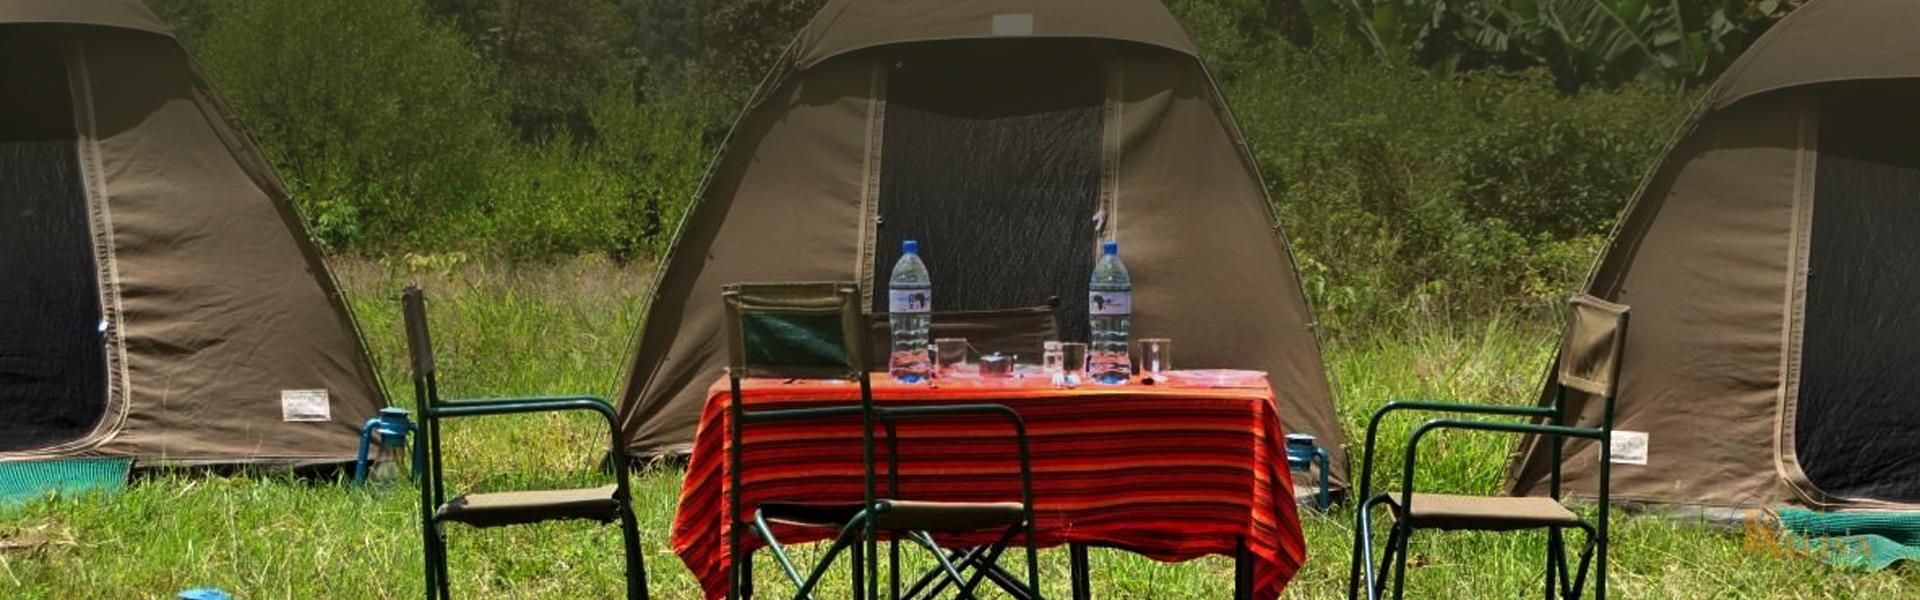 Budget Camping Safari(Serengeti)